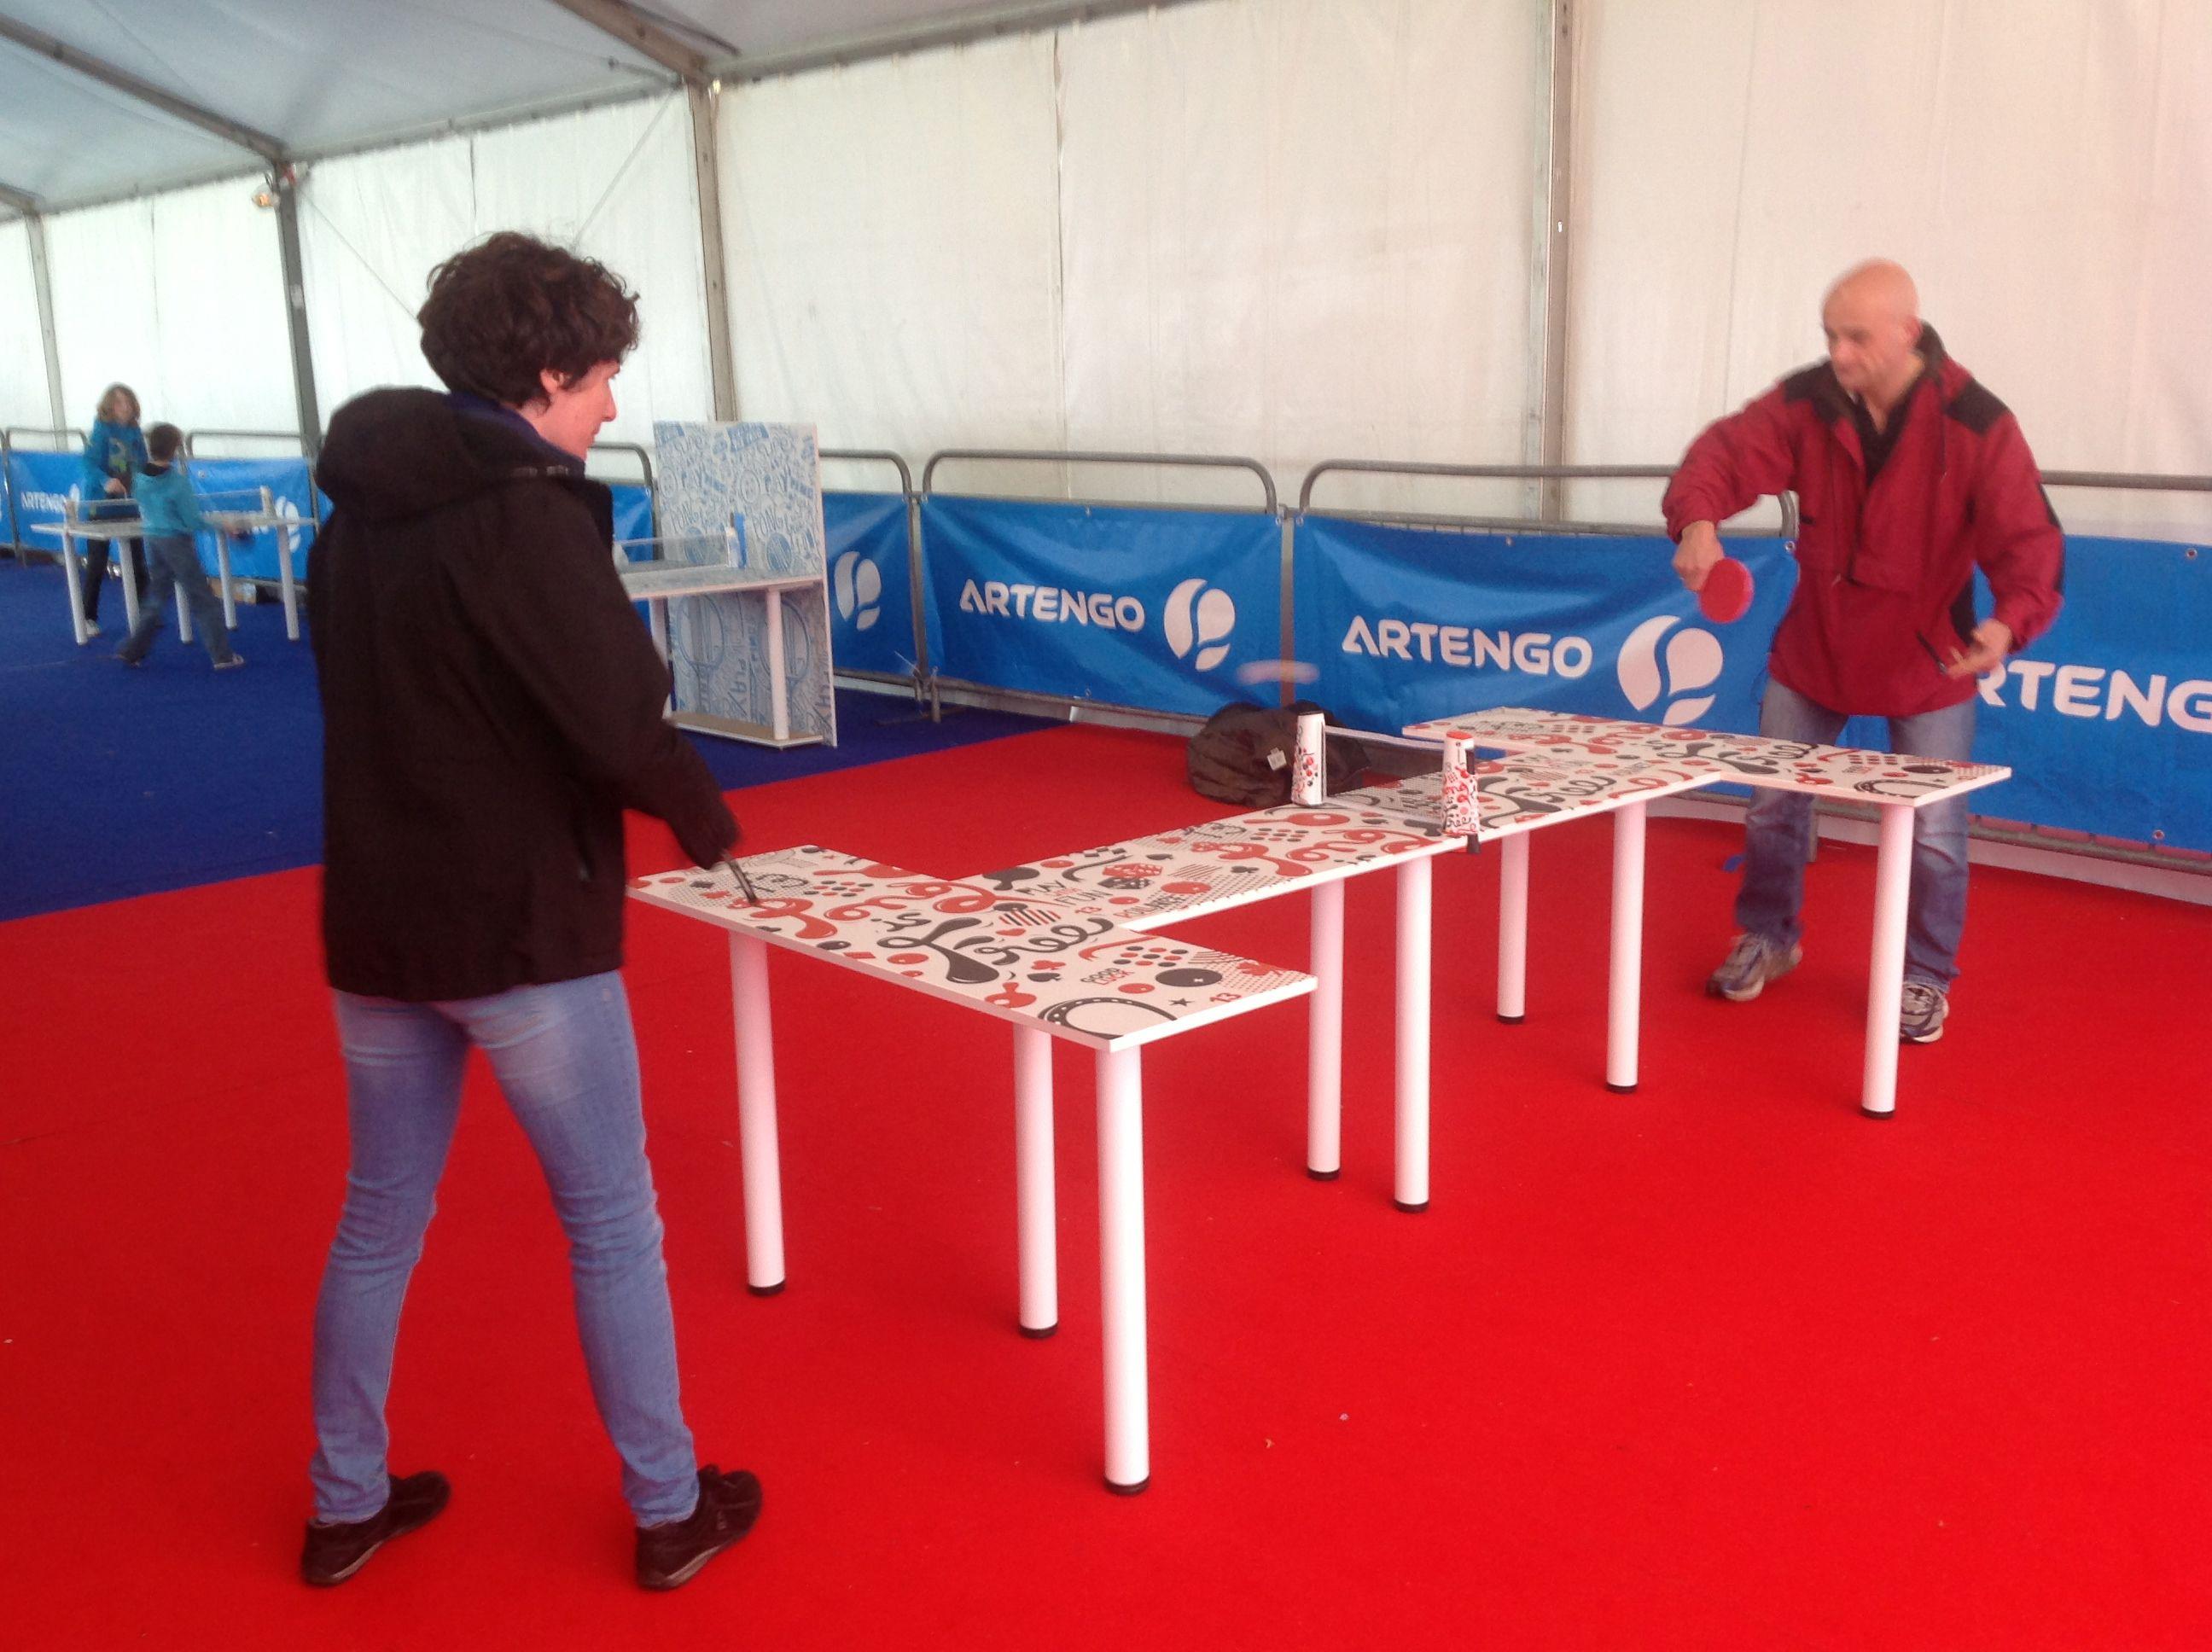 mondial ping tour - artengo free ping pong | mondial ping tour